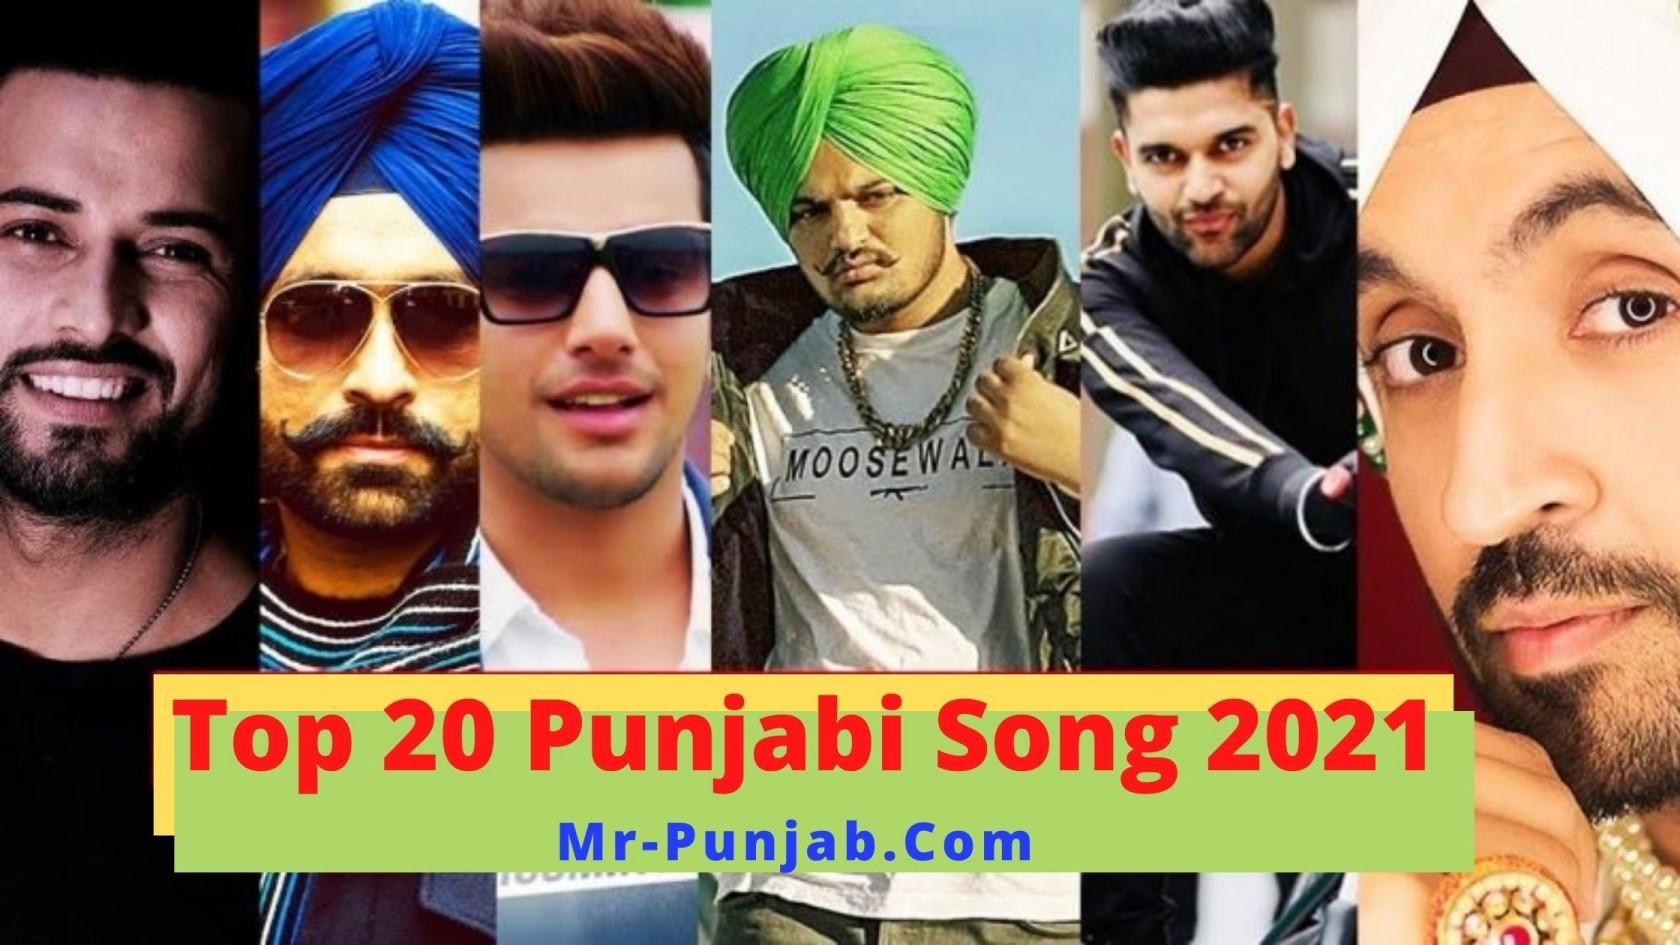 Punjabi single track mp3 songs